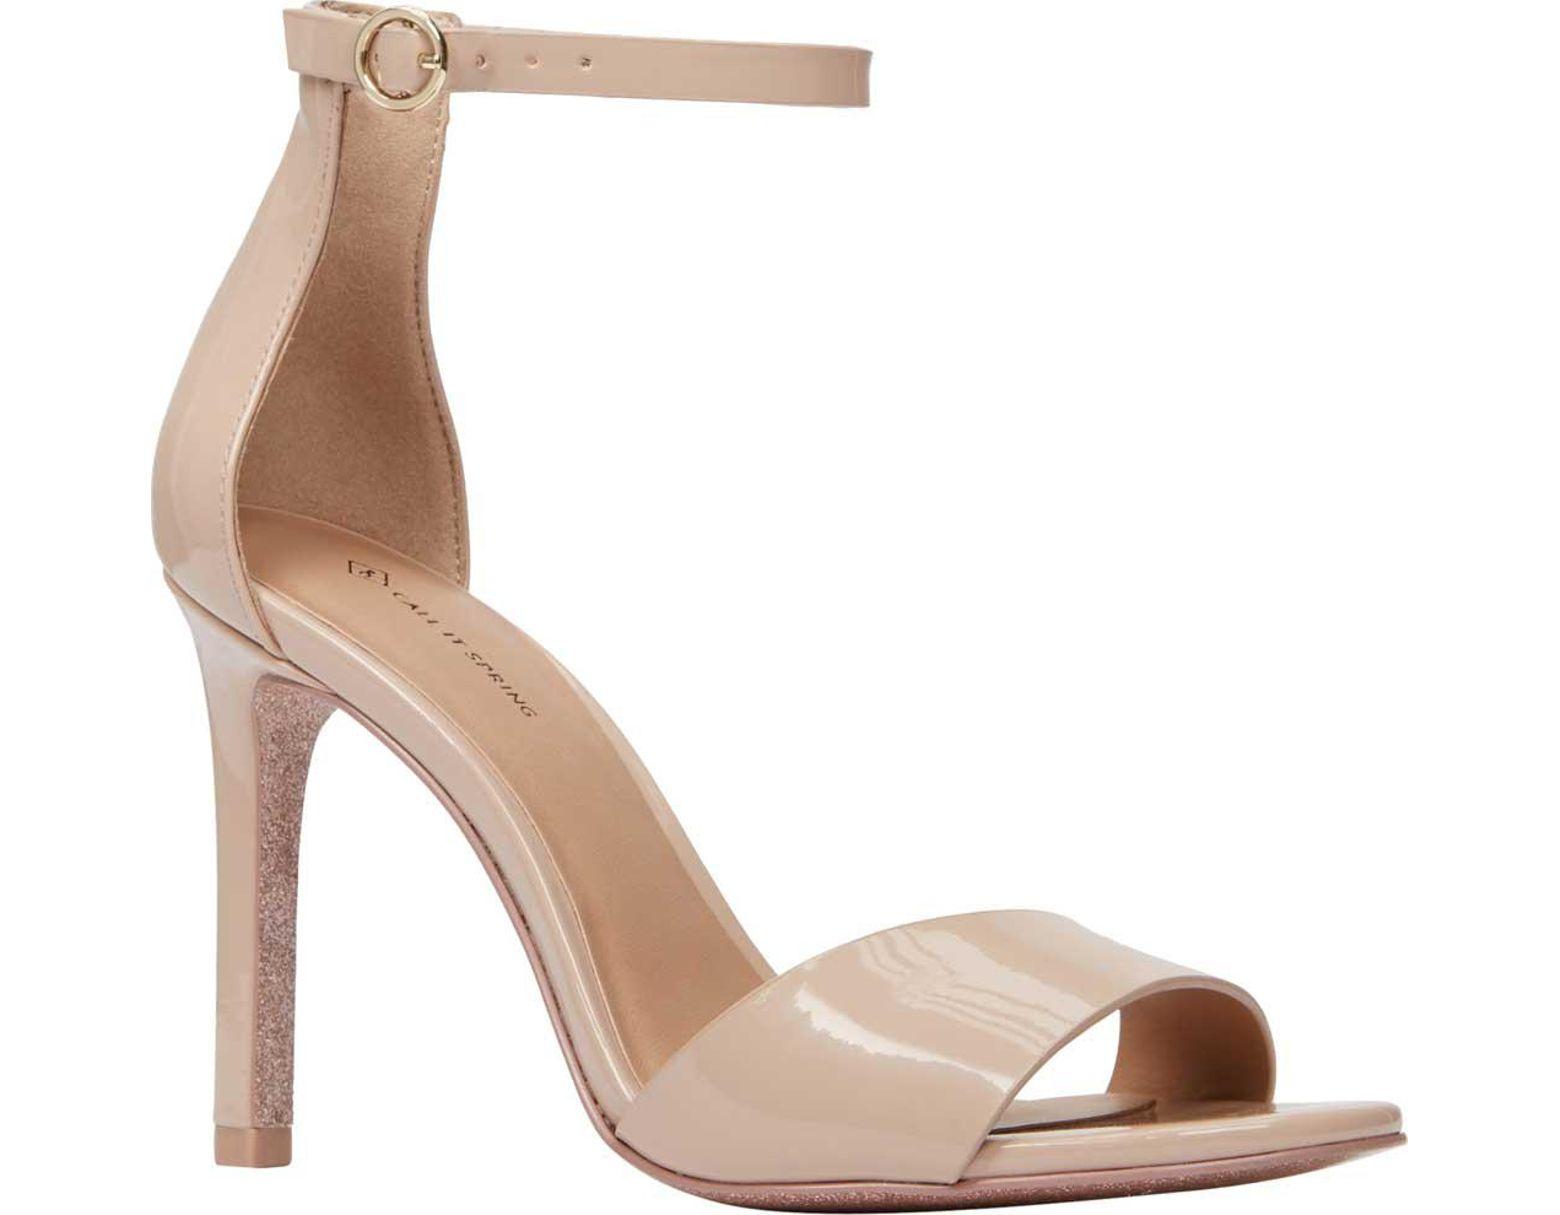 fcced10f63 Call It Spring Dellmar Ankle Strap Sandal - Lyst